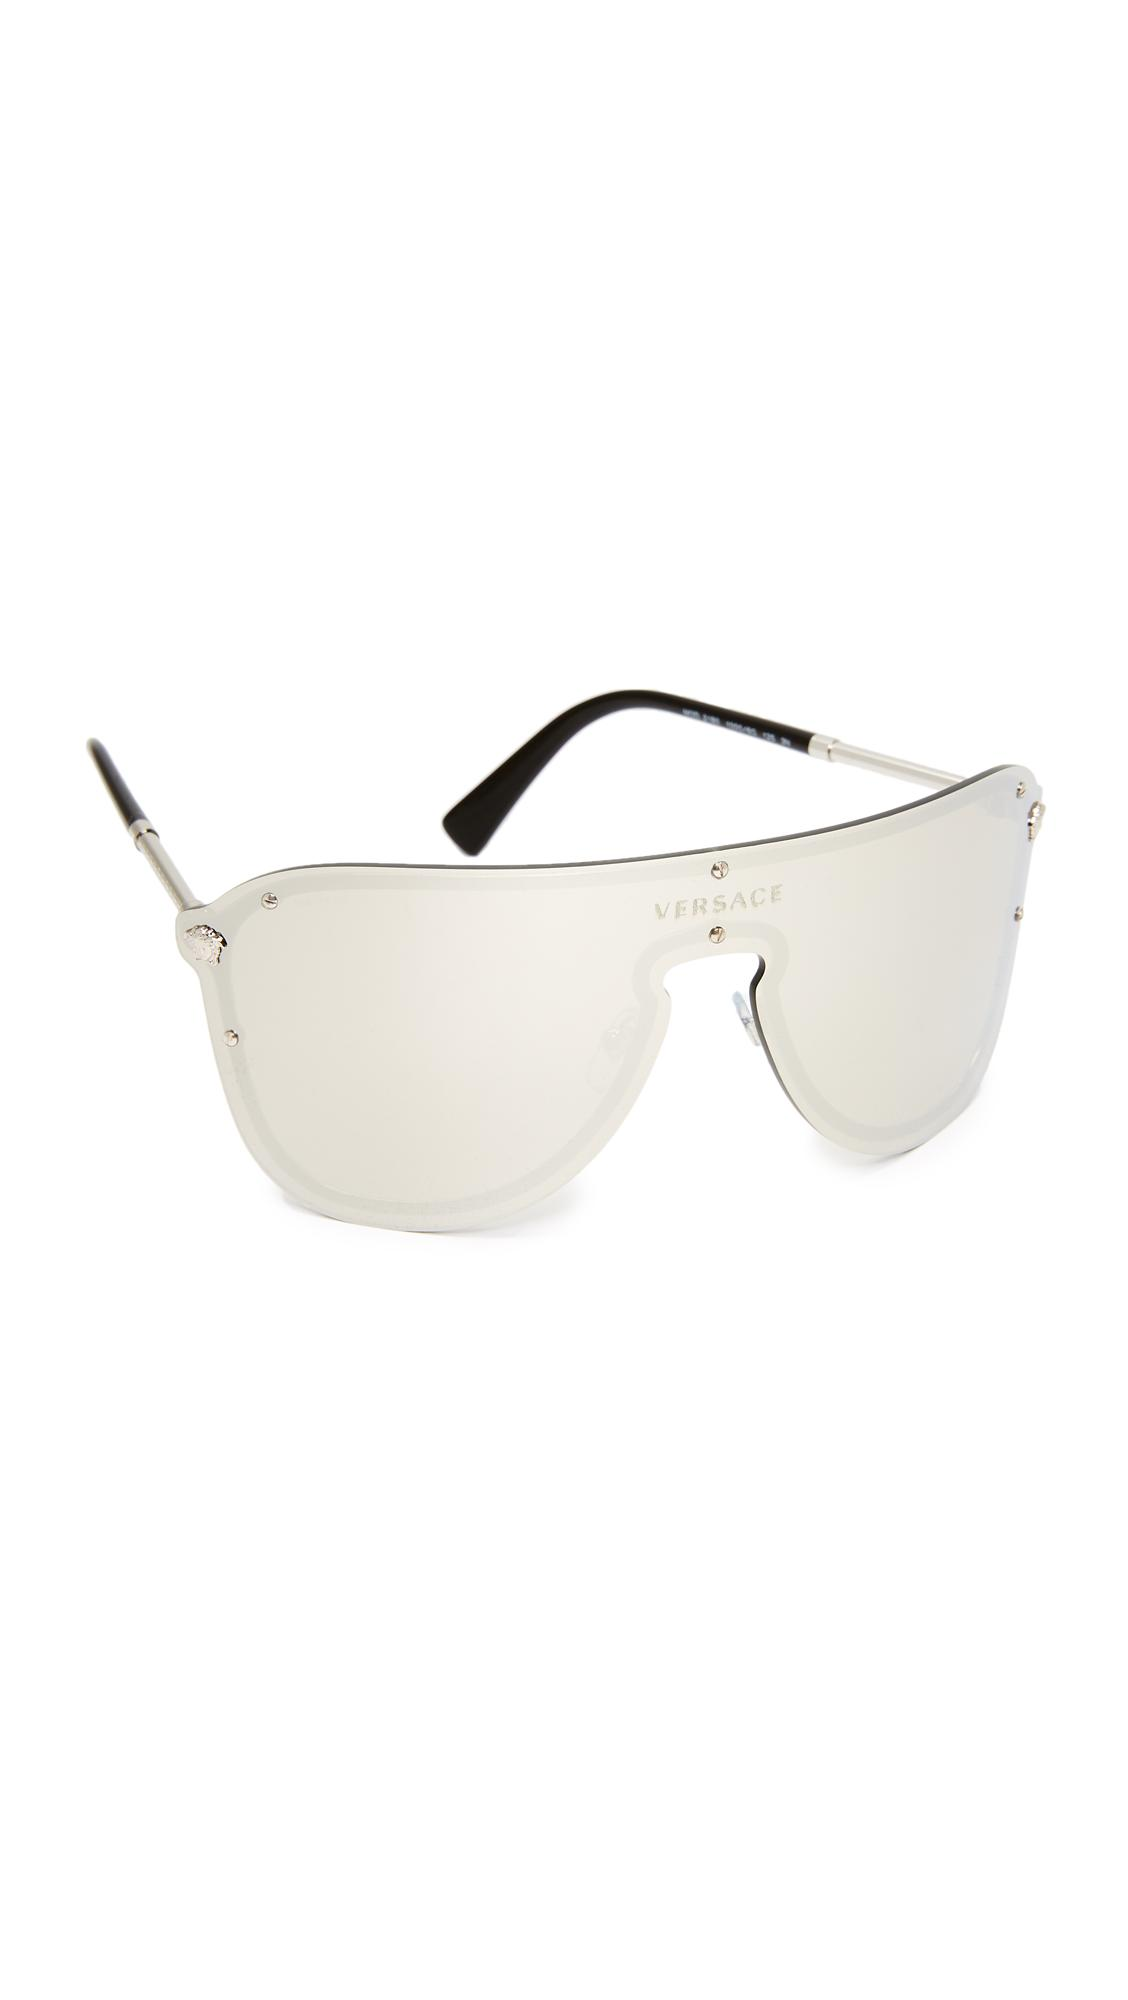 c9c27d783294 Lyst - Versace Mirrored Shield Sunglasses in Metallic